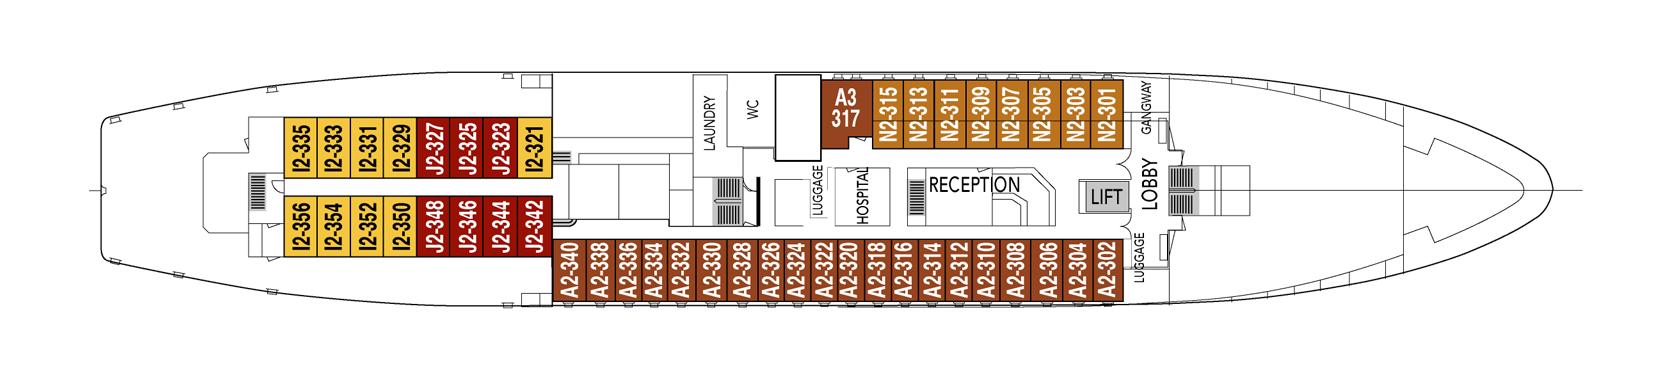 Hurtigruten MS Vesteralen Deck Plans Deck C.png